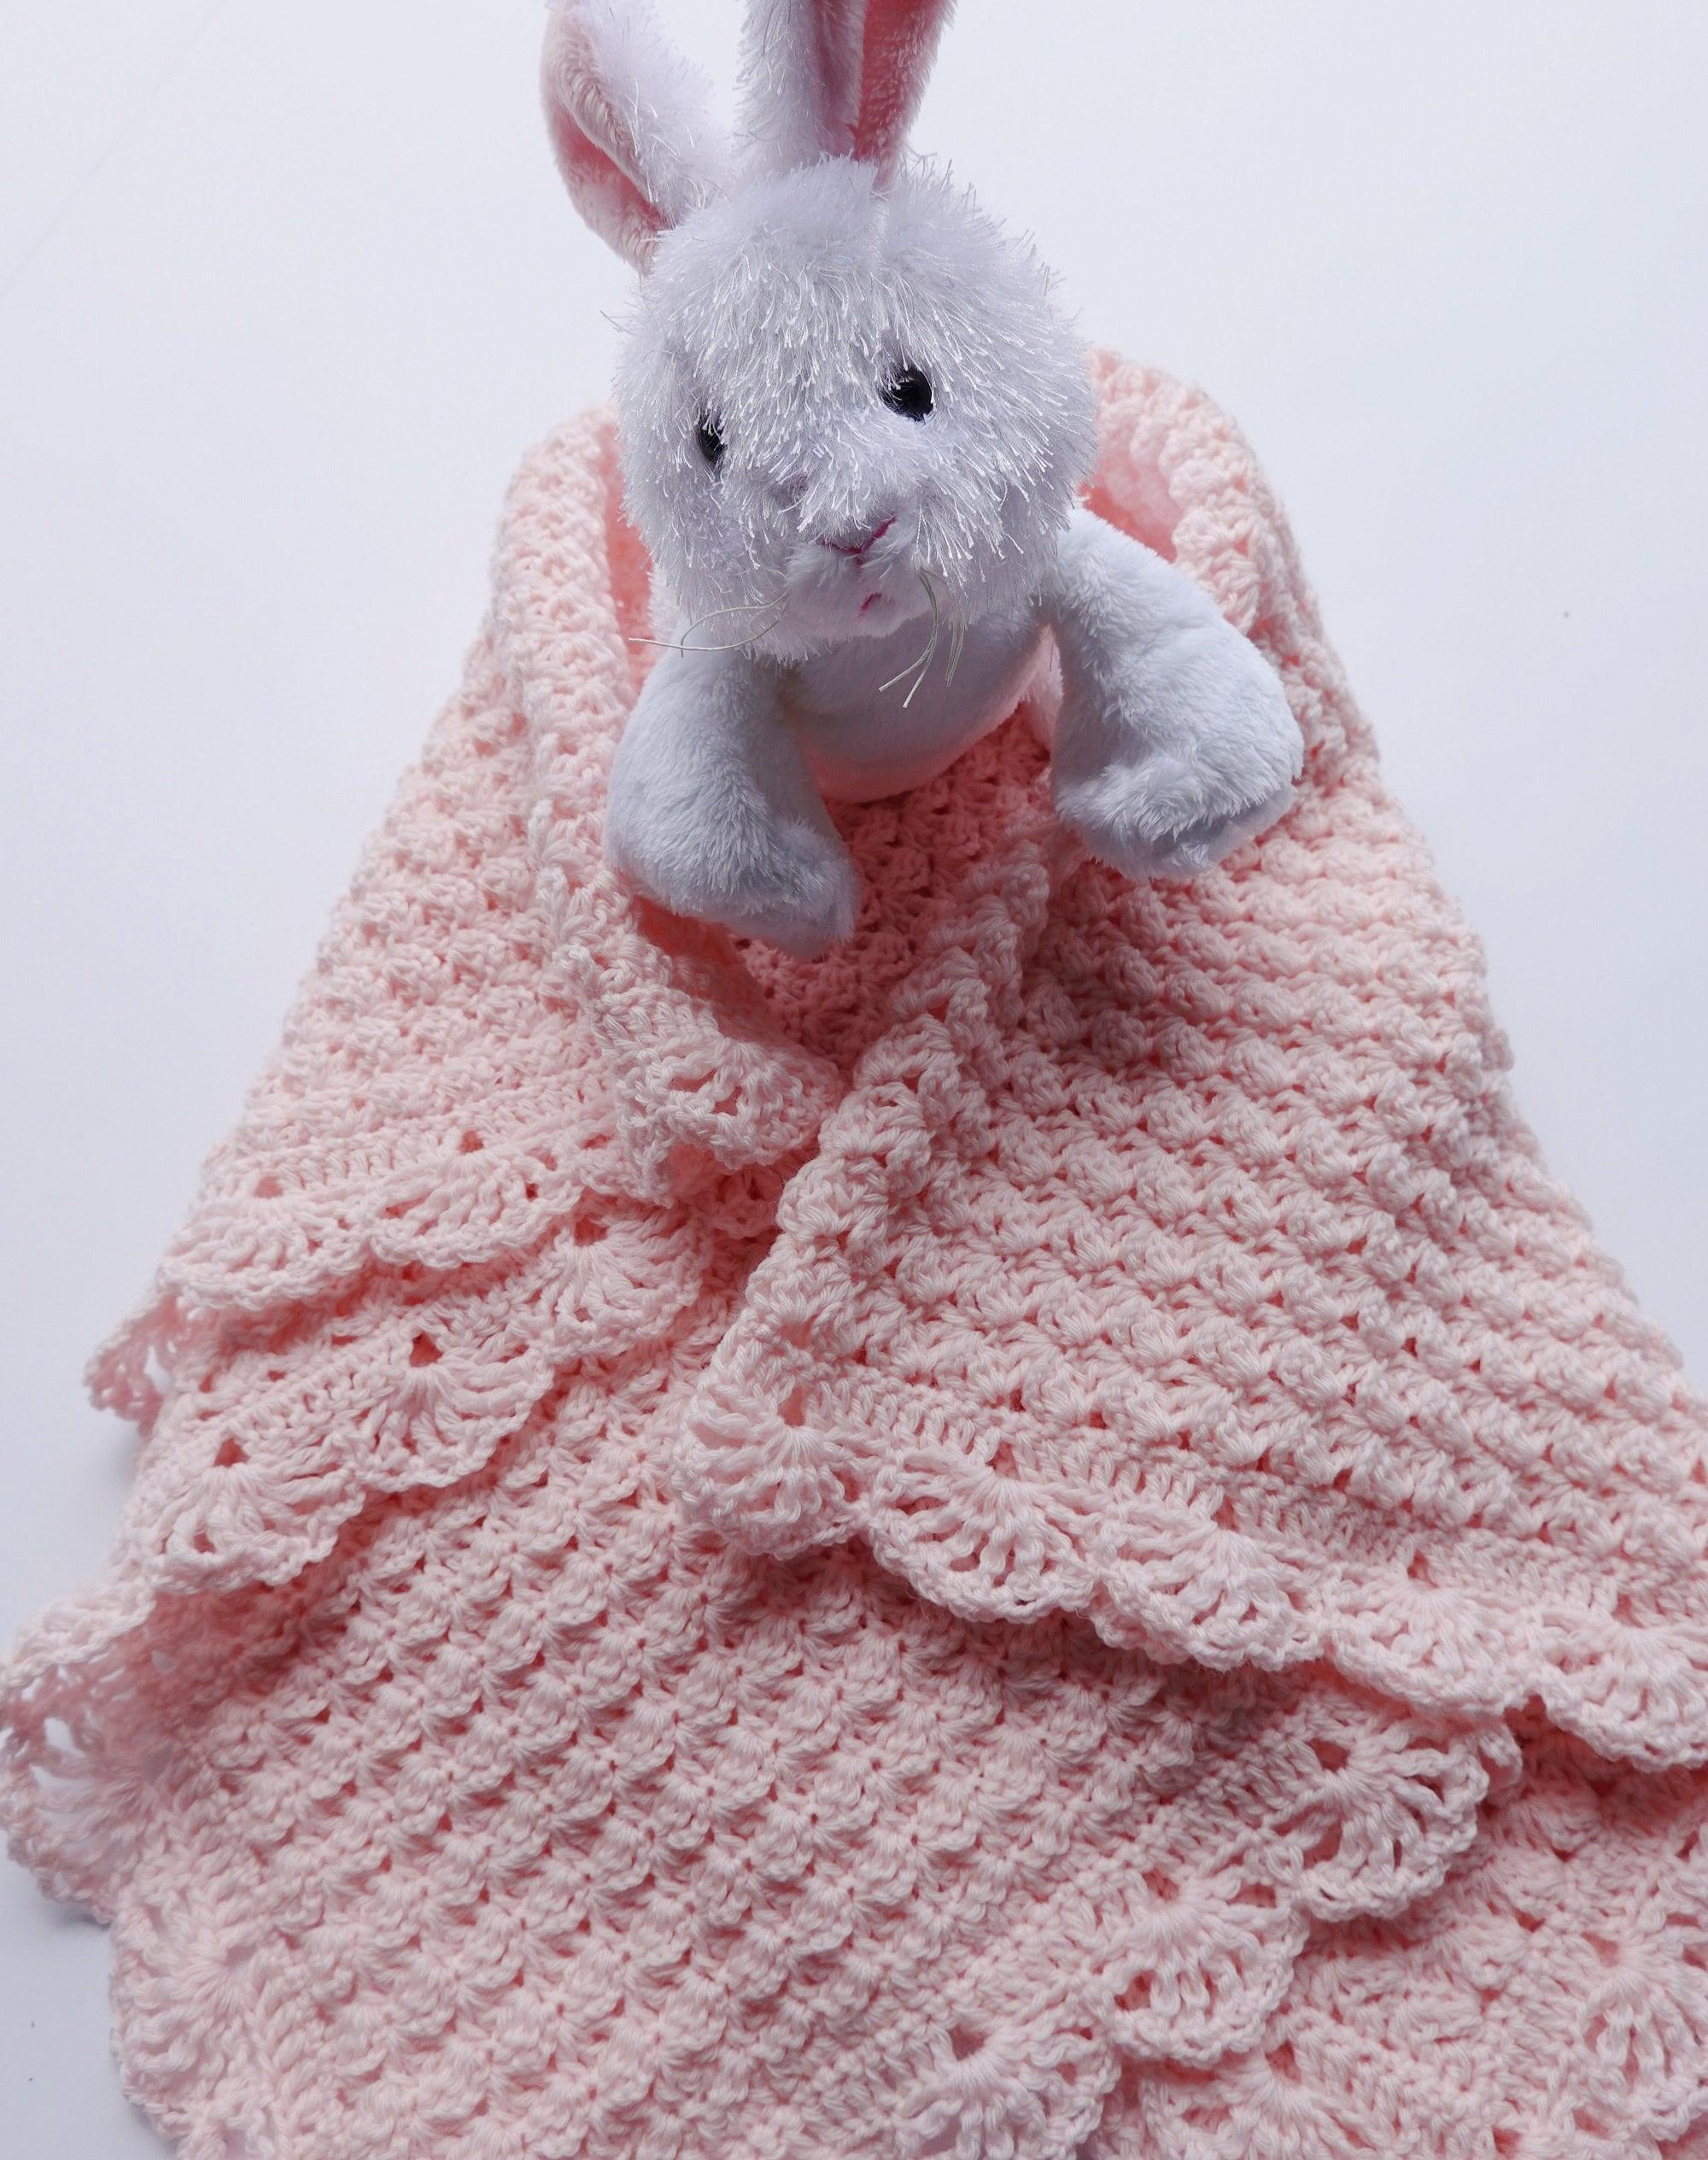 Crochet Baby Blanket, Blanket Merino Wool, Pink Baby Blanket, Merino Wool Baby Blanket, Newborn Baby Blanket, Baby Gift, Christening Gift